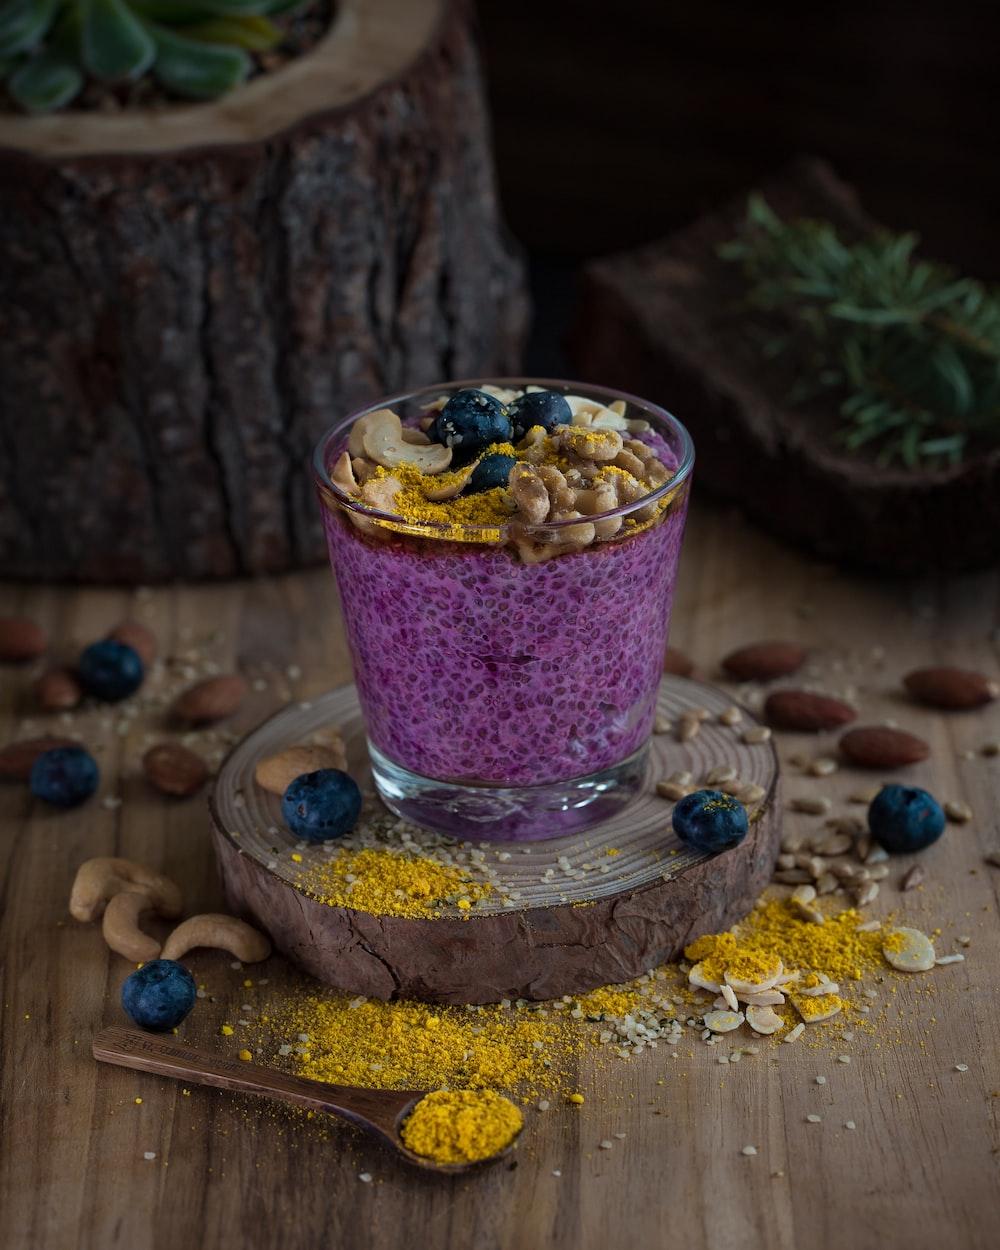 dessert served on drinking glass